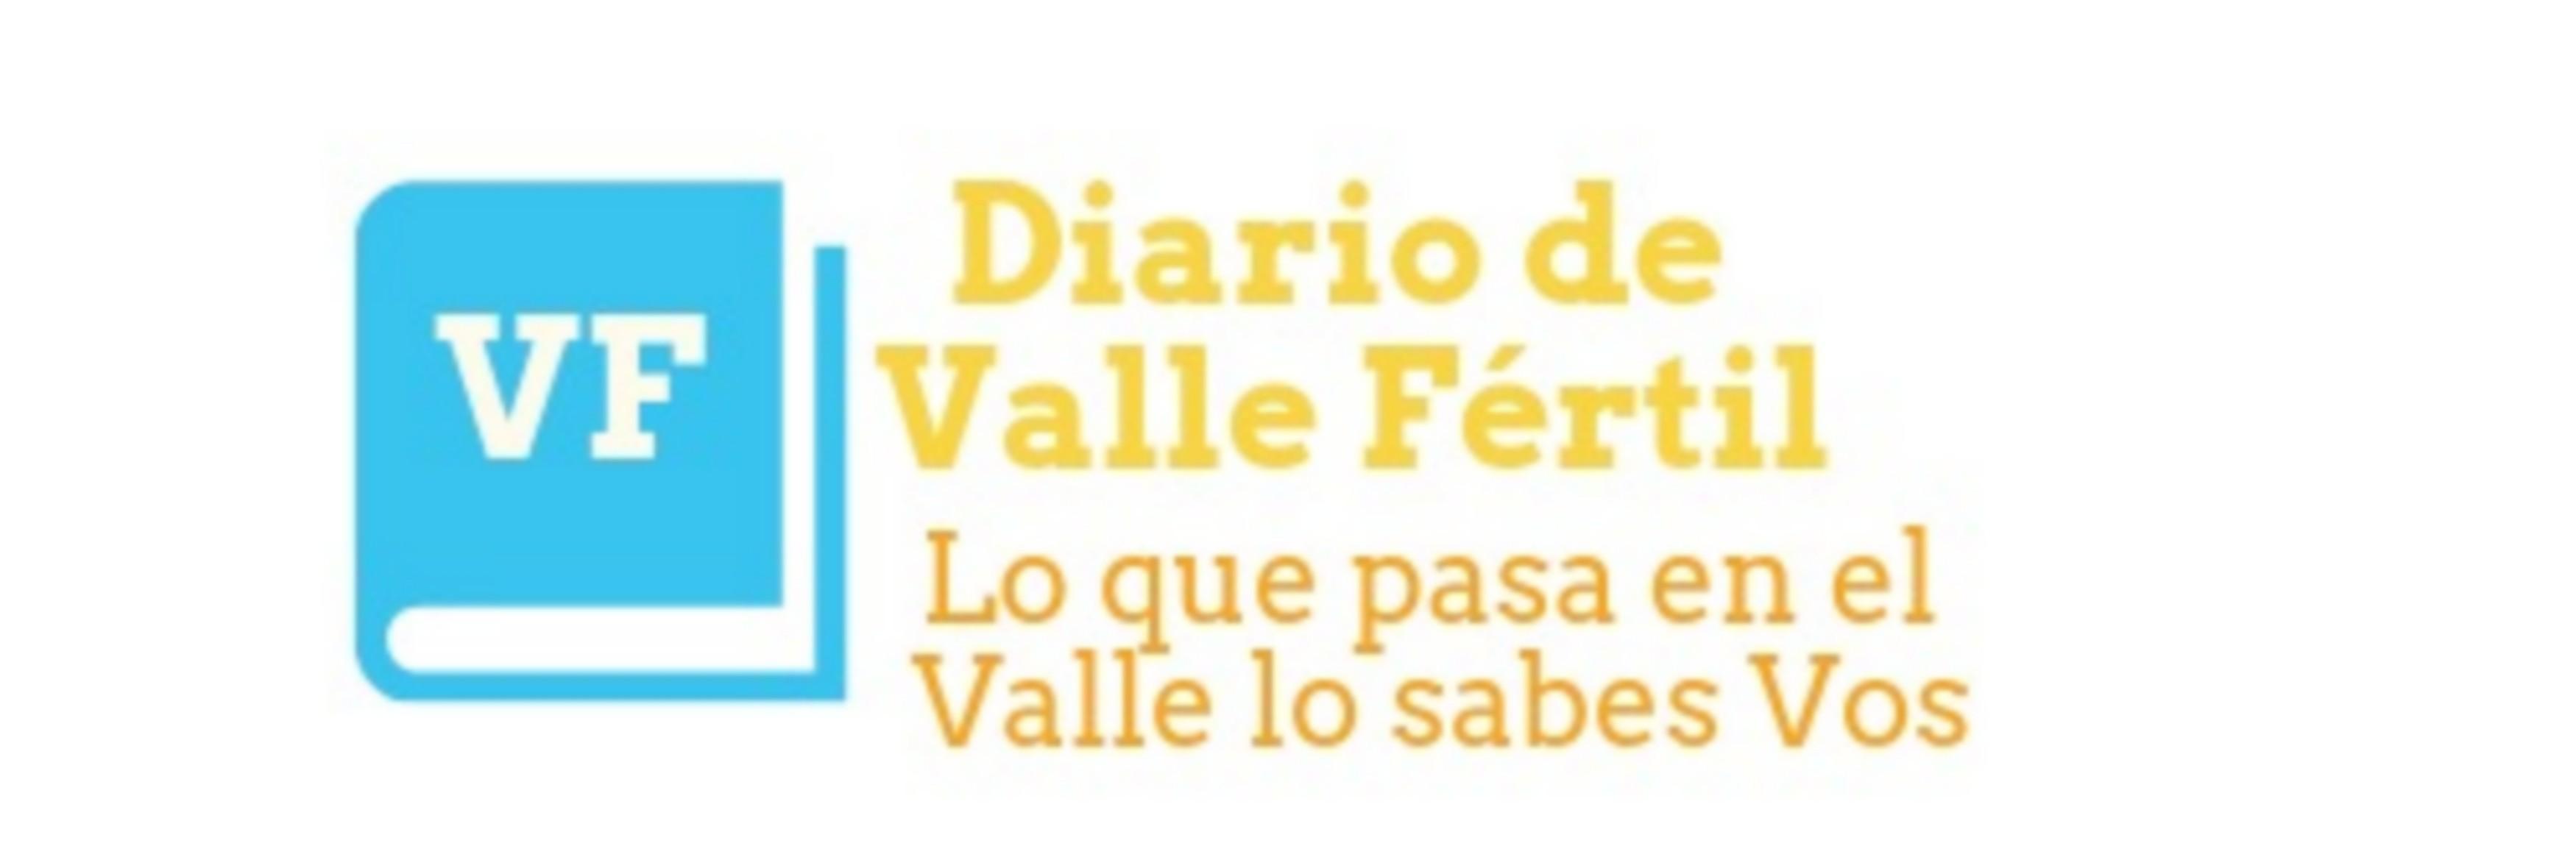 diario de Valle Fertil